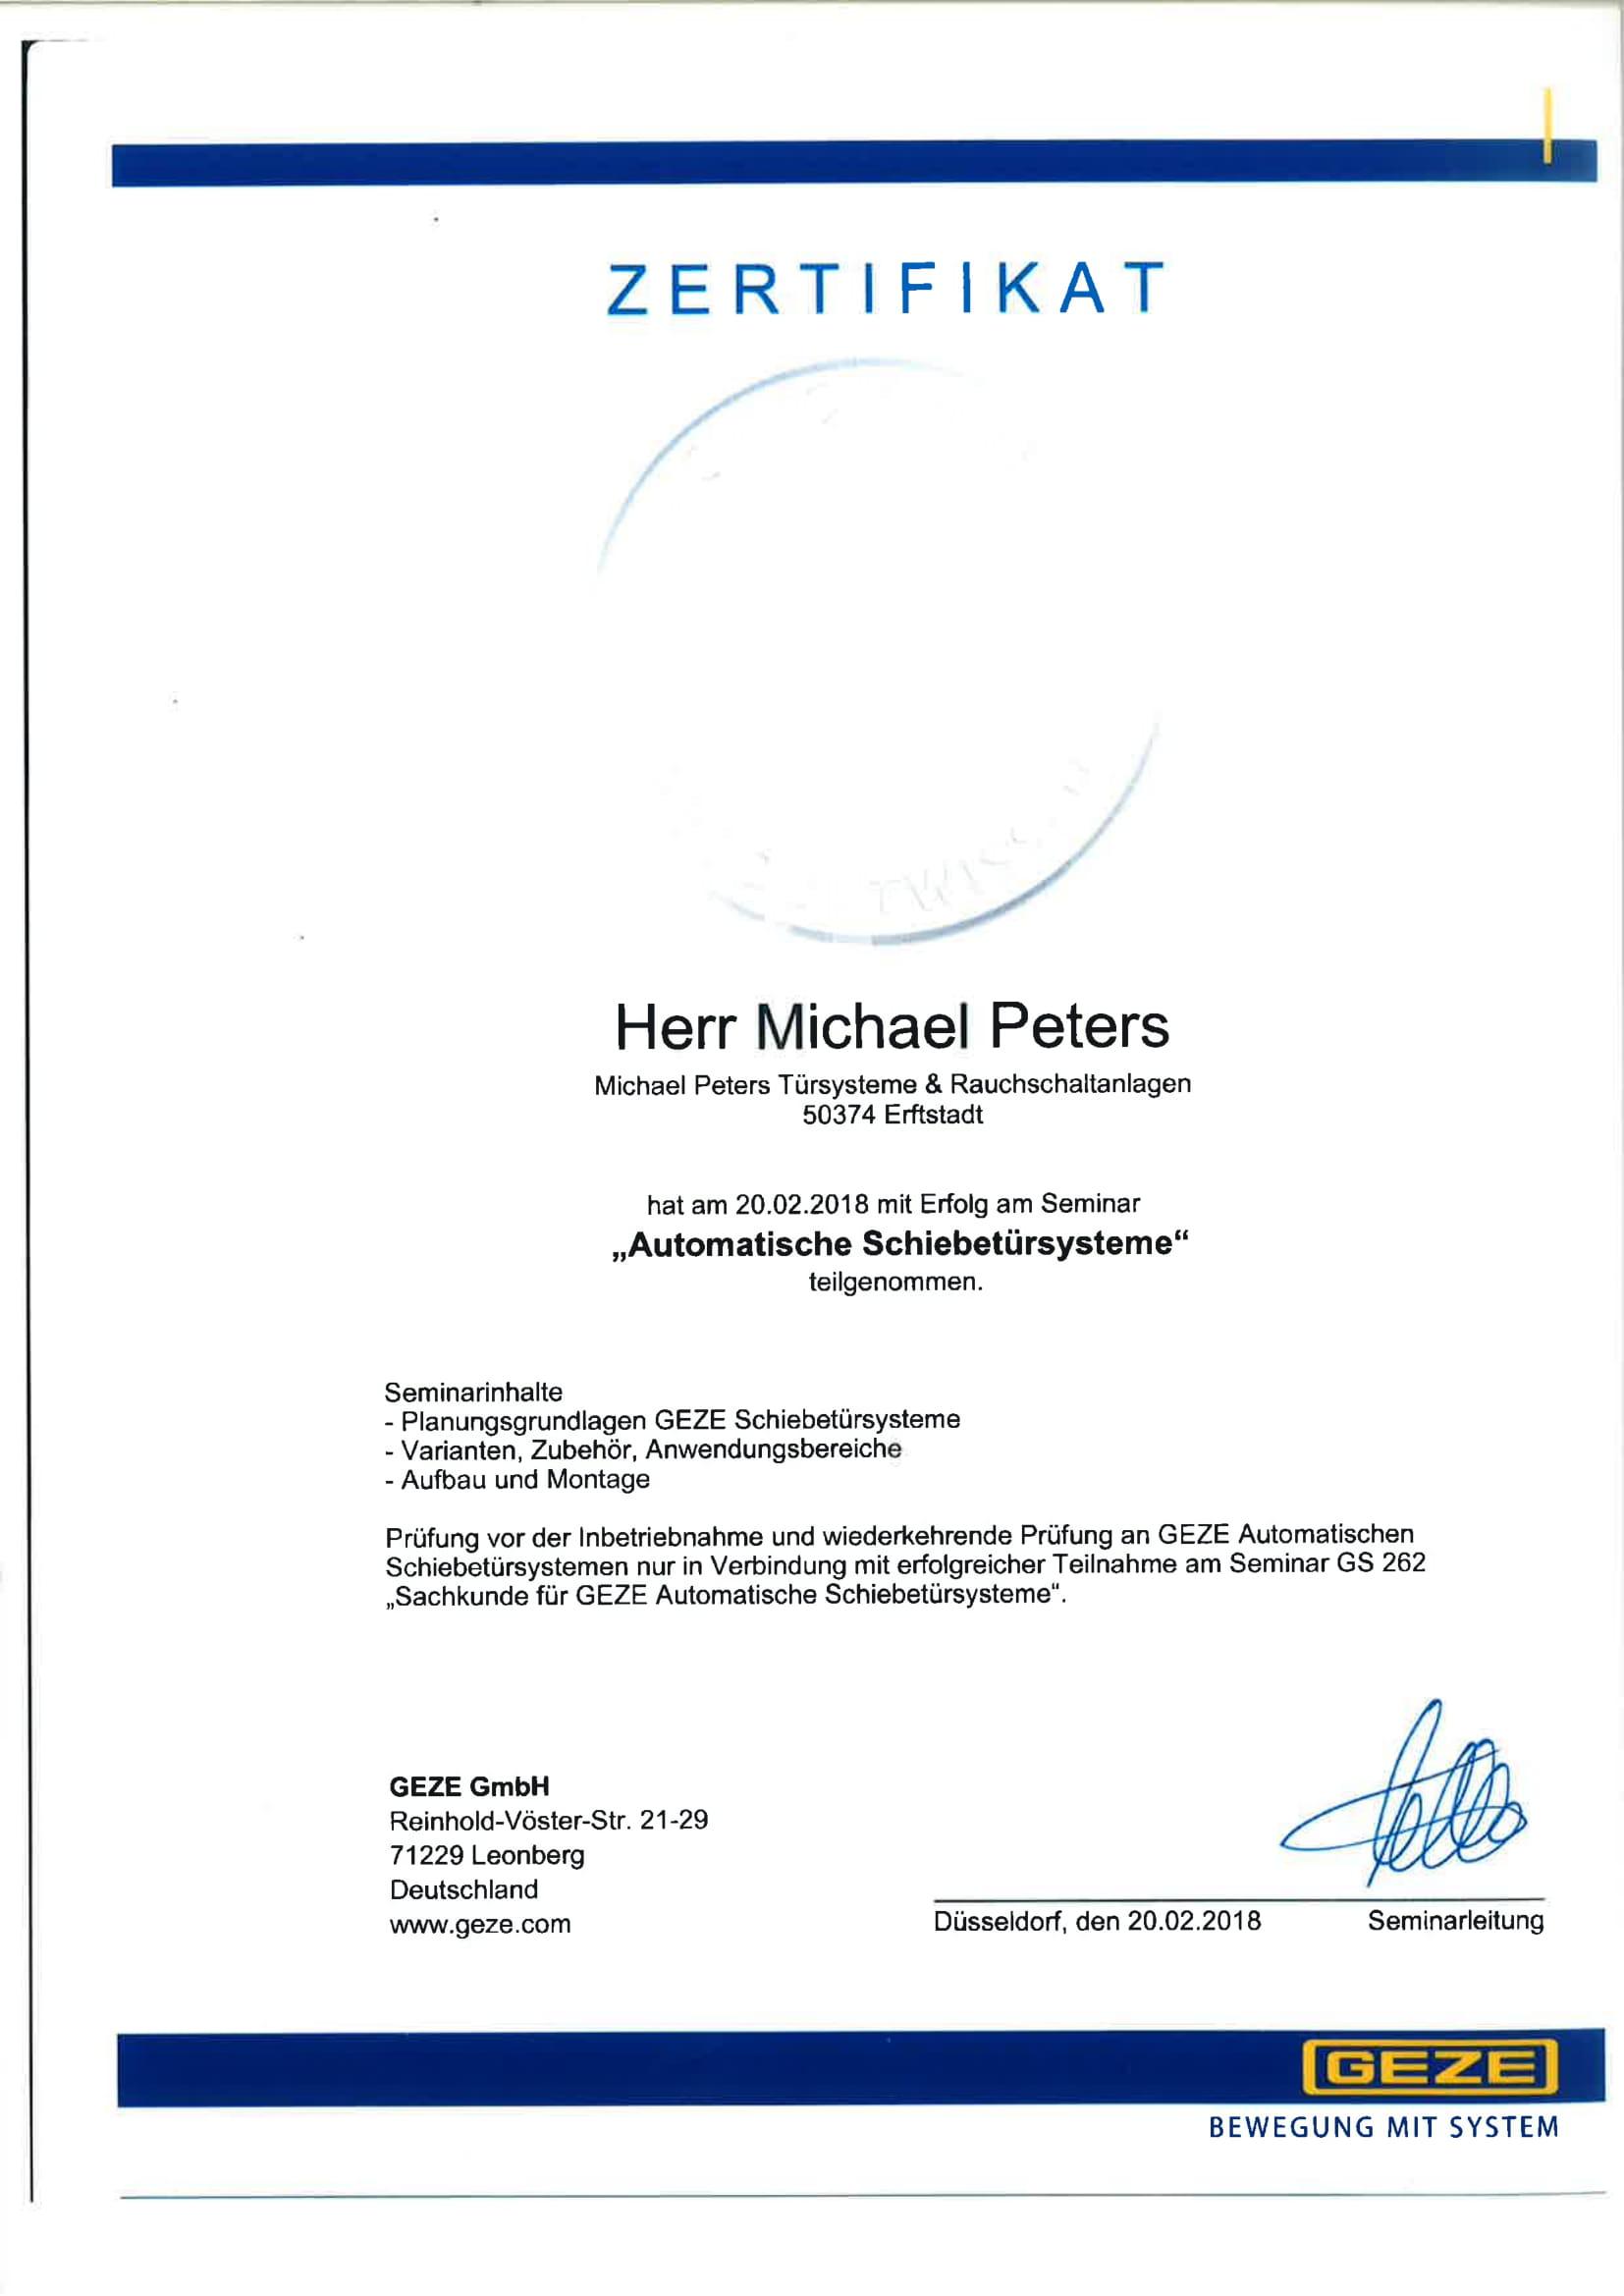 Zertifikat Geze Automatische Schiebetuersysteme